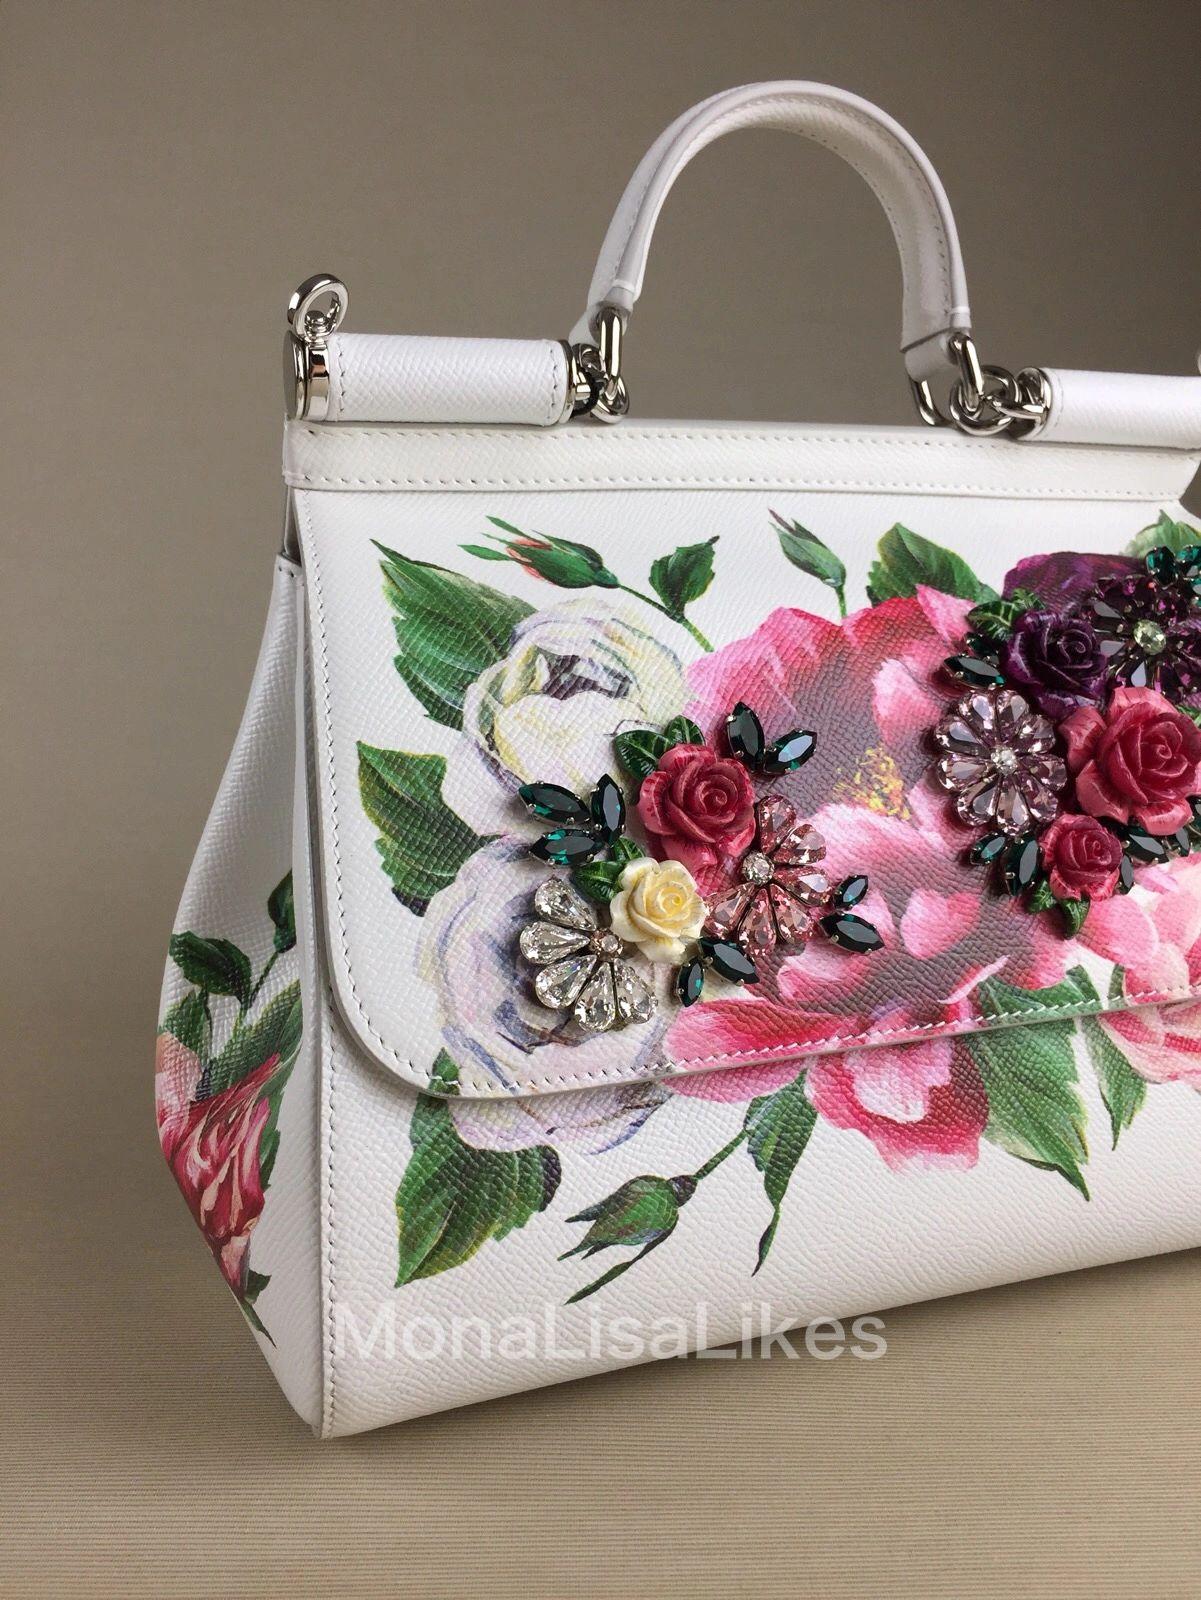 DOLCE & GABBANA Miss Sicily Peony Embellished handbag